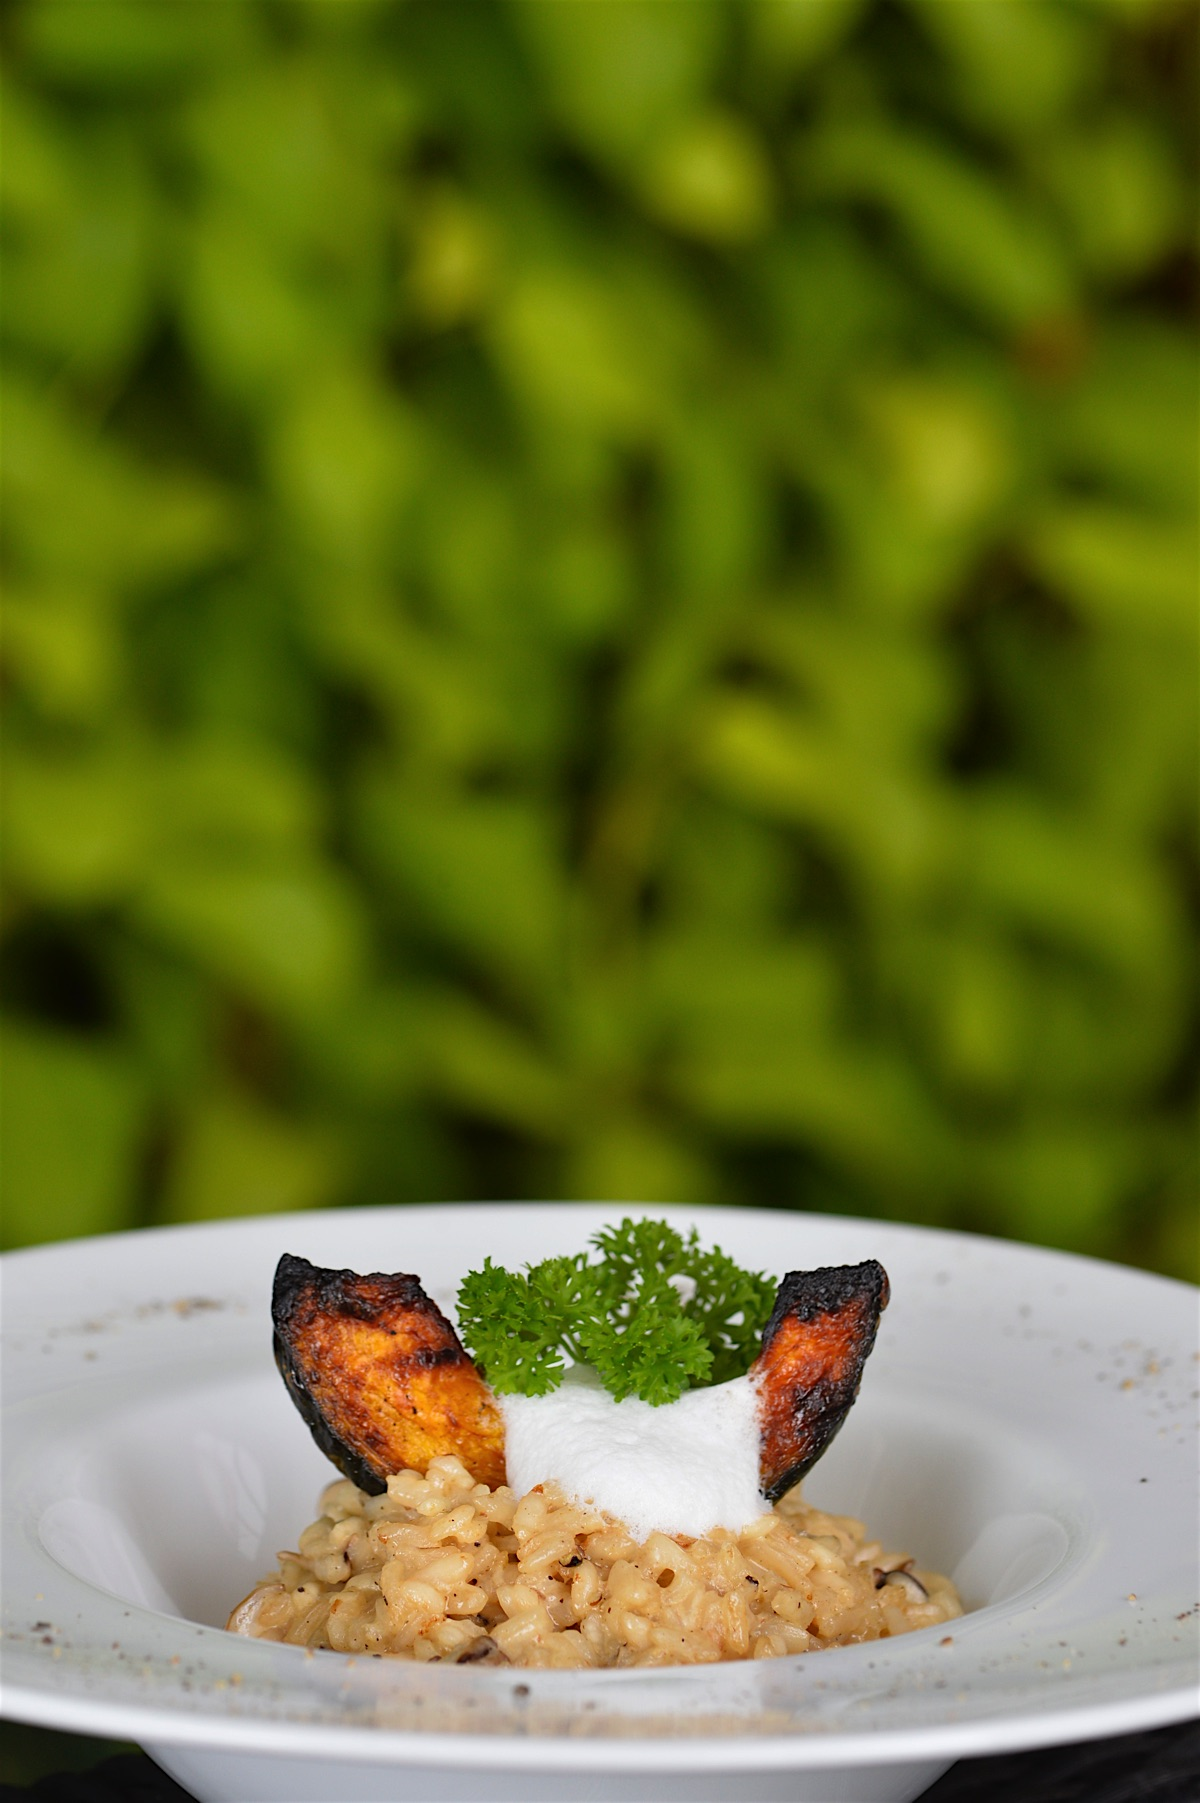 Fine dining davids kitchen 24 chiang mai luxurious for 24 star thai cuisine